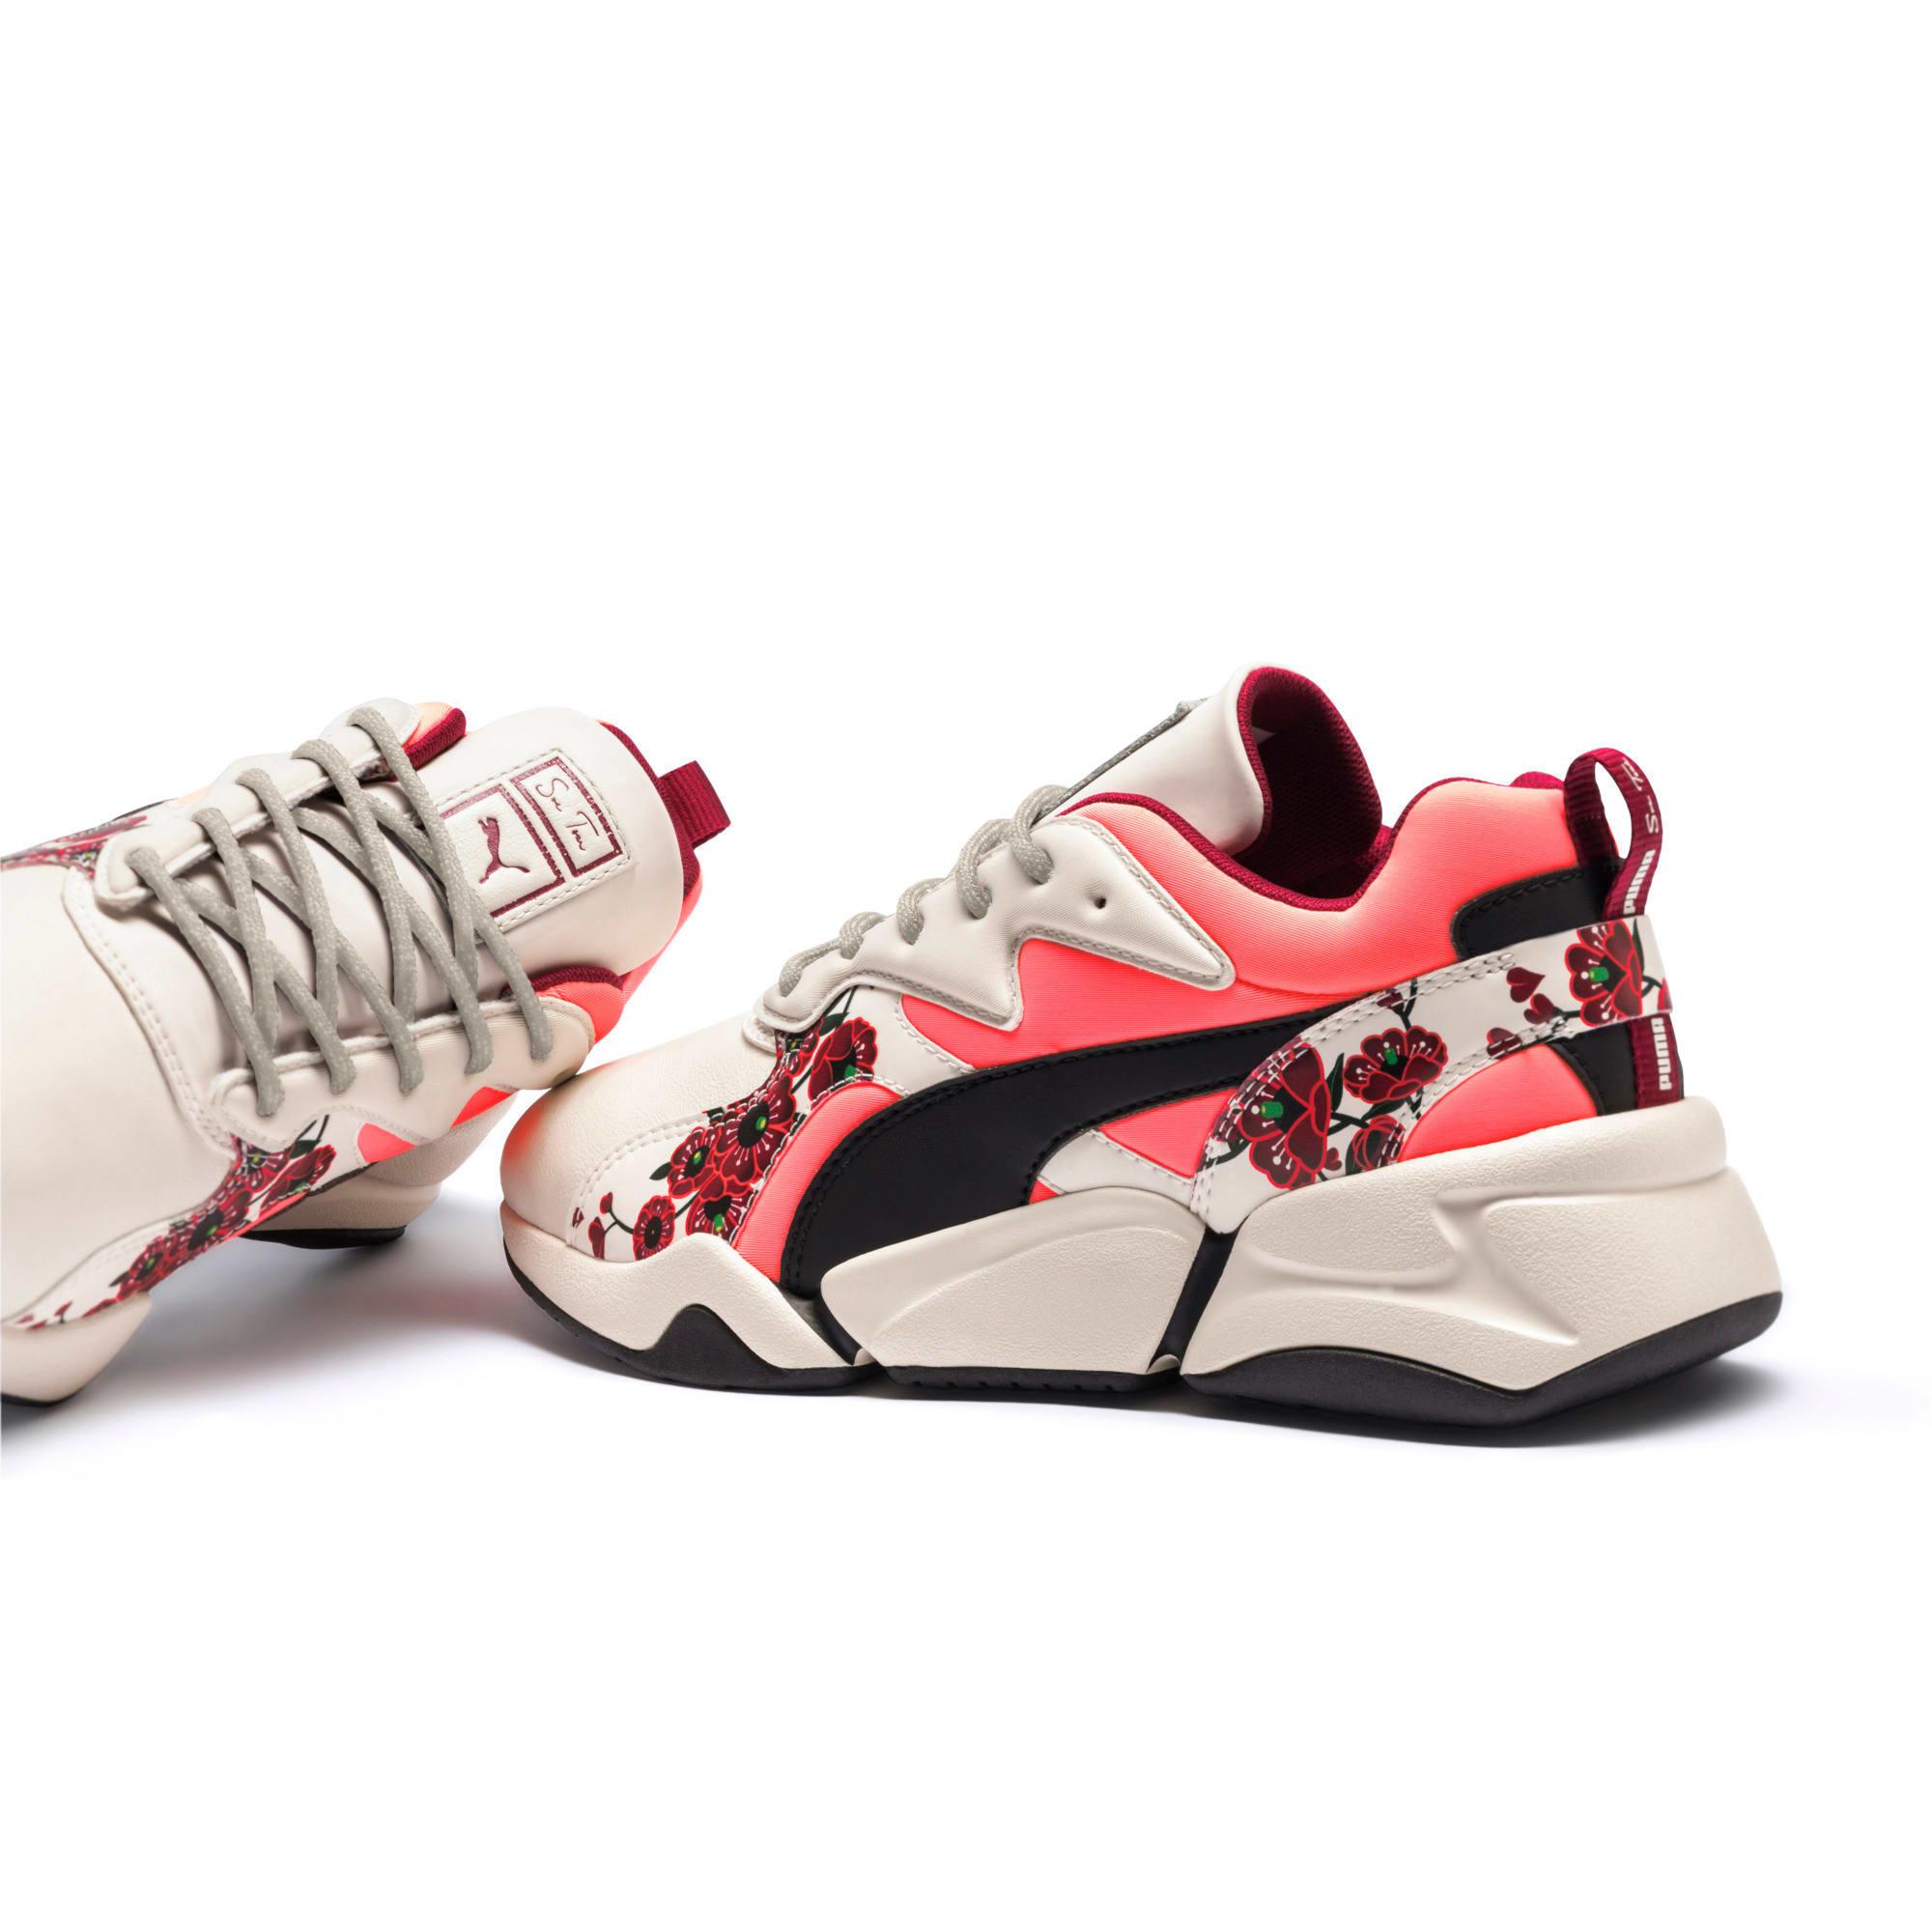 Thumbnail 10 of PUMA x SUE TSAI Nova Cherry Bombs sneakers voor dames, Powder Puff-Puma Black, medium